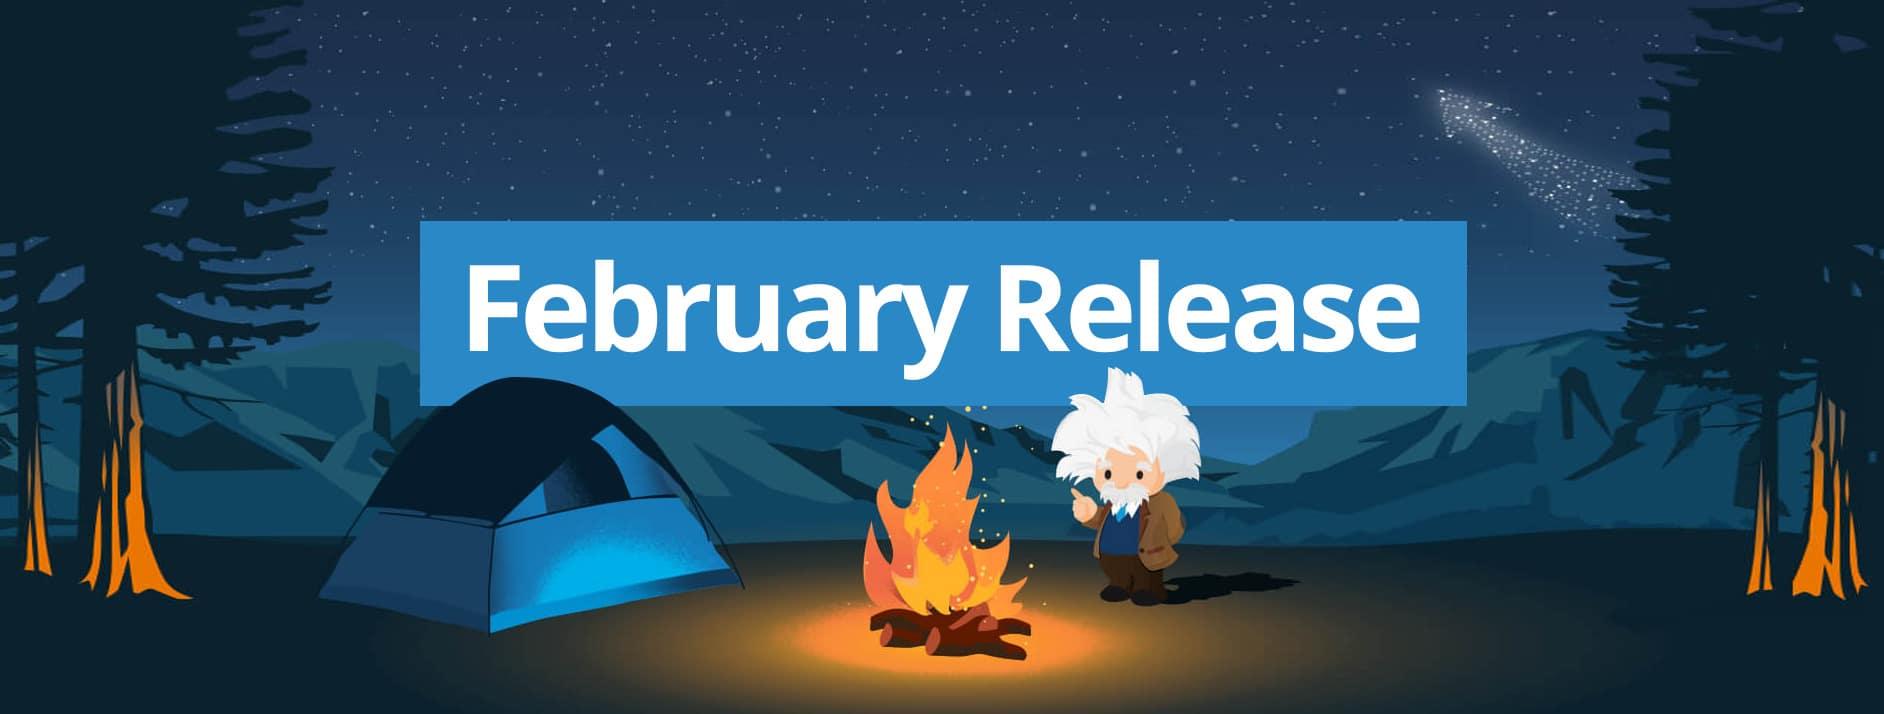 02. Release February 2020